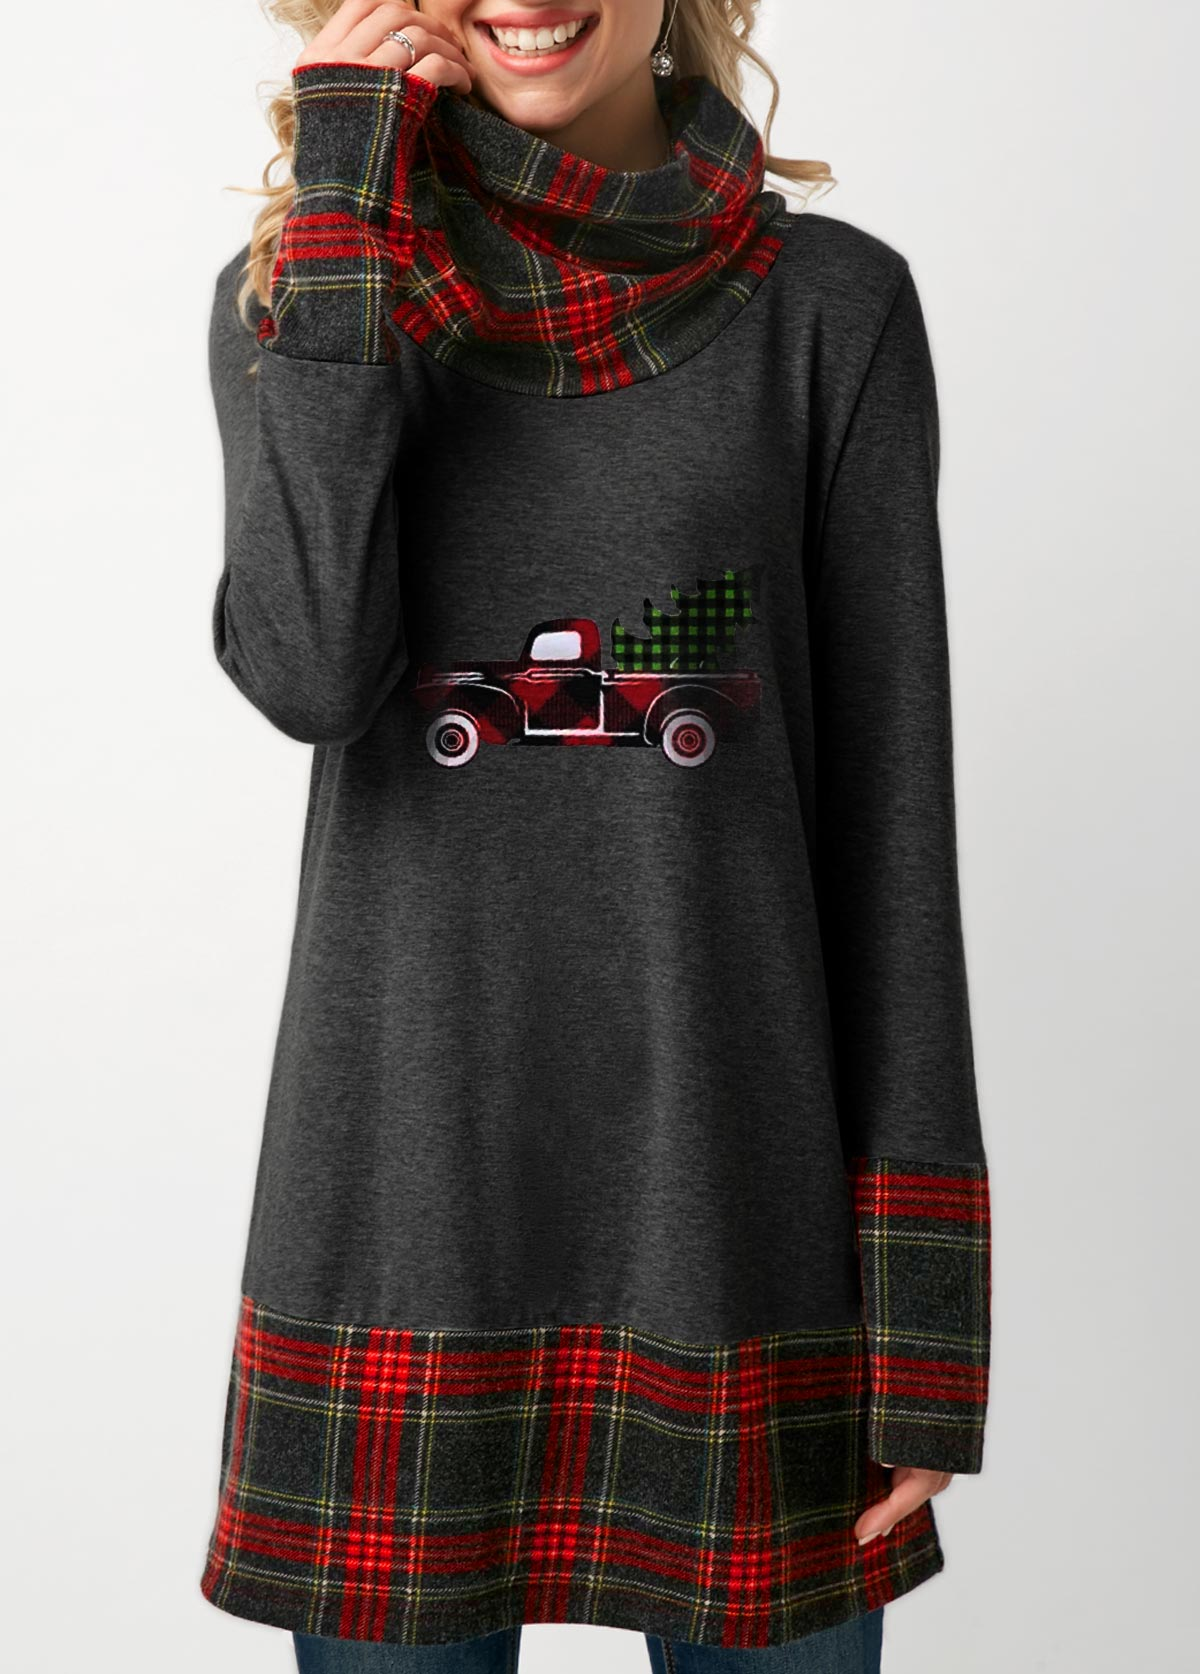 Plaid Print Long Sleeve Dark Grey Christmas T Shirt